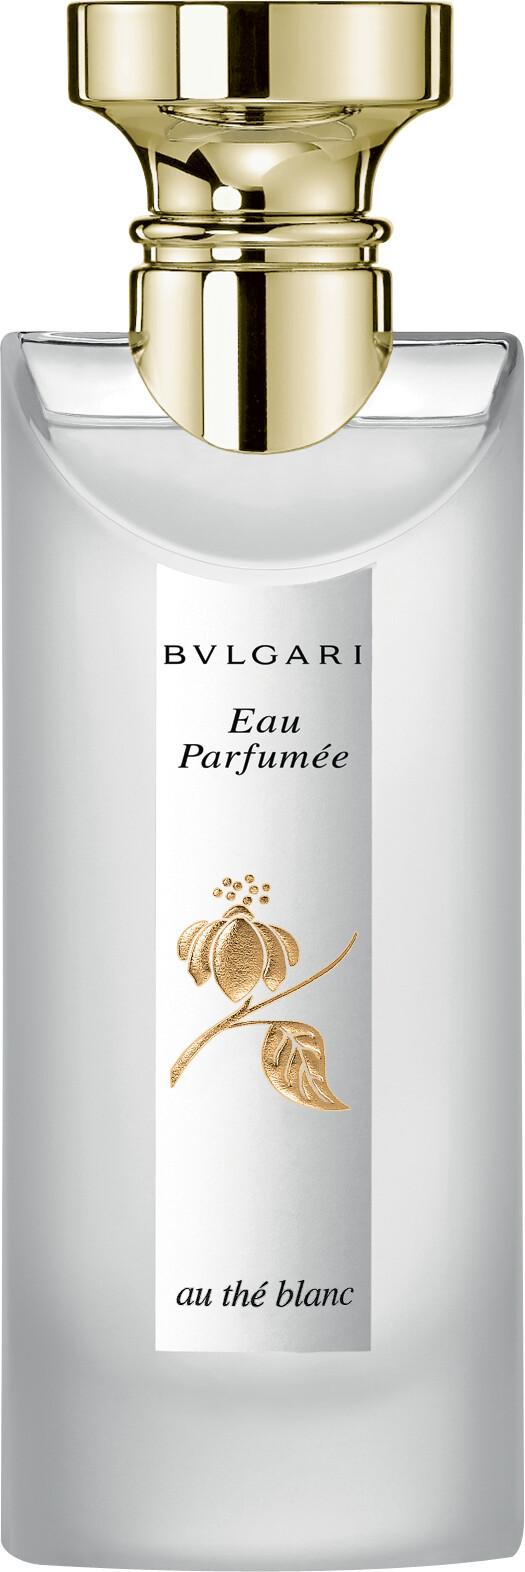 bvlgari eau parfumee au the blanc eau de cologne spray. Black Bedroom Furniture Sets. Home Design Ideas